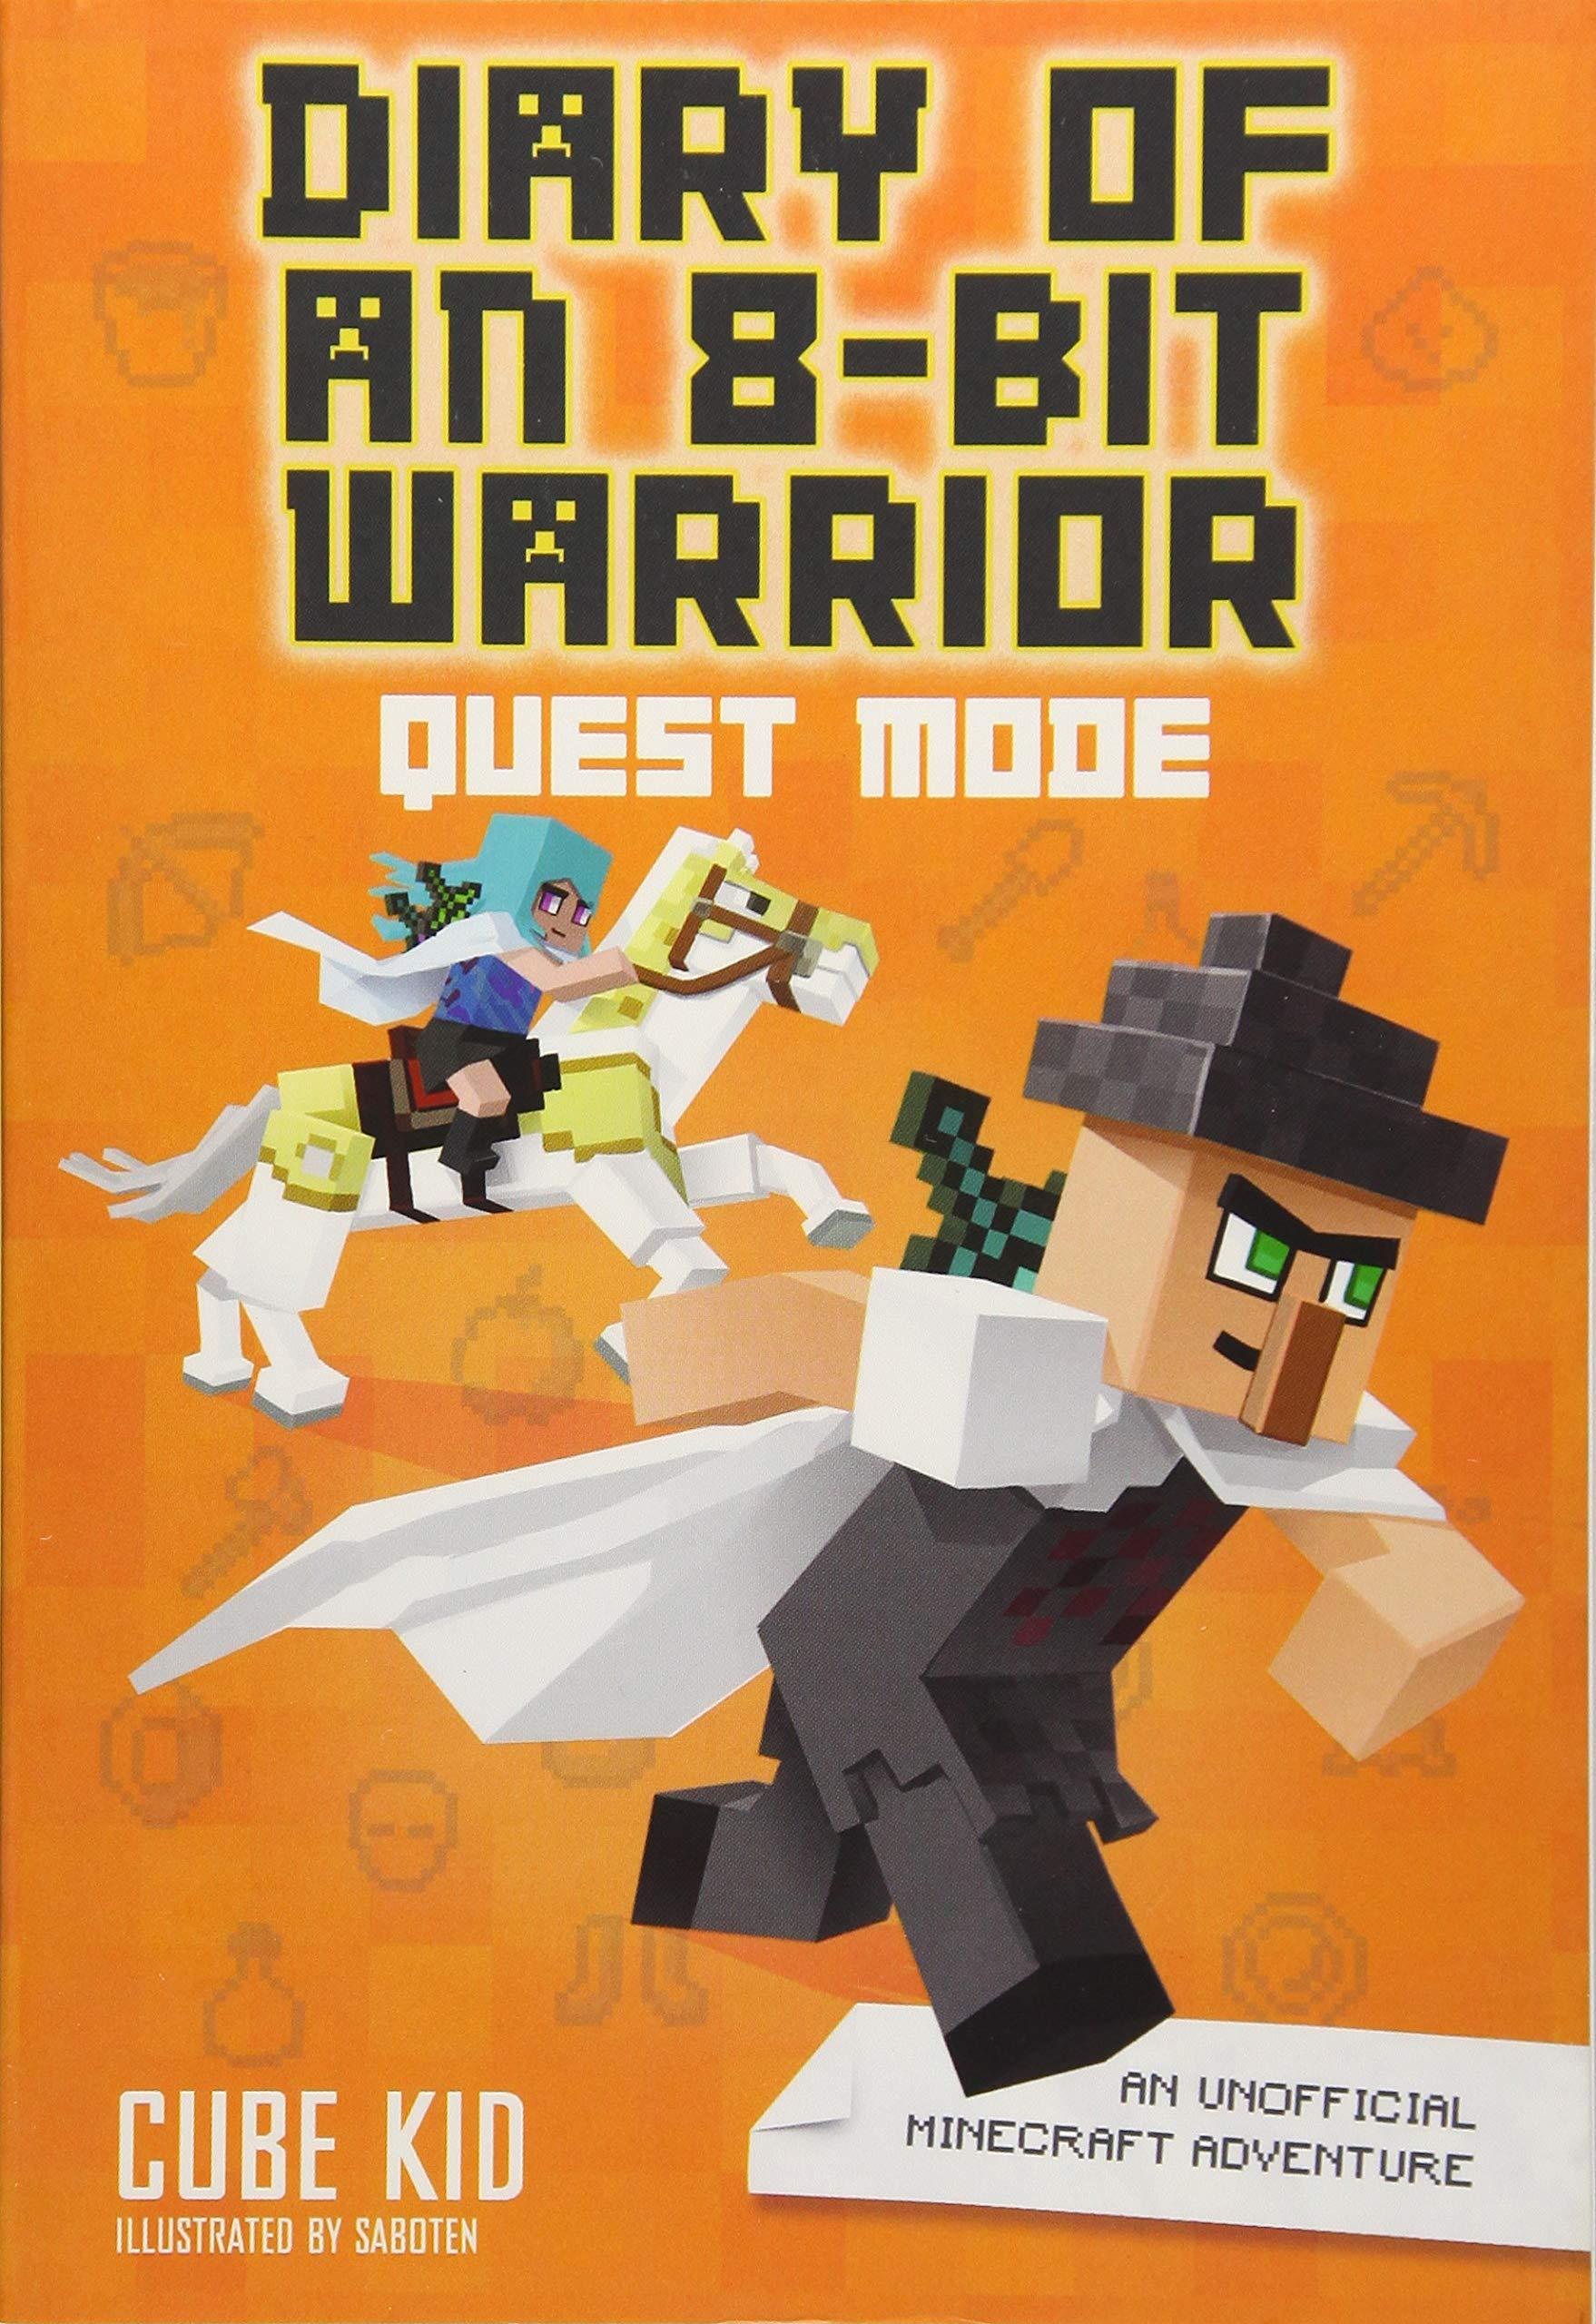 Diary Of An 8 Bit Warrior Quest Mode Book 5 8 Bit Warrior Series An Unofficial Minecraft Adventure Volume 5 Cube Kid 9781449492526 Amazon Com Books